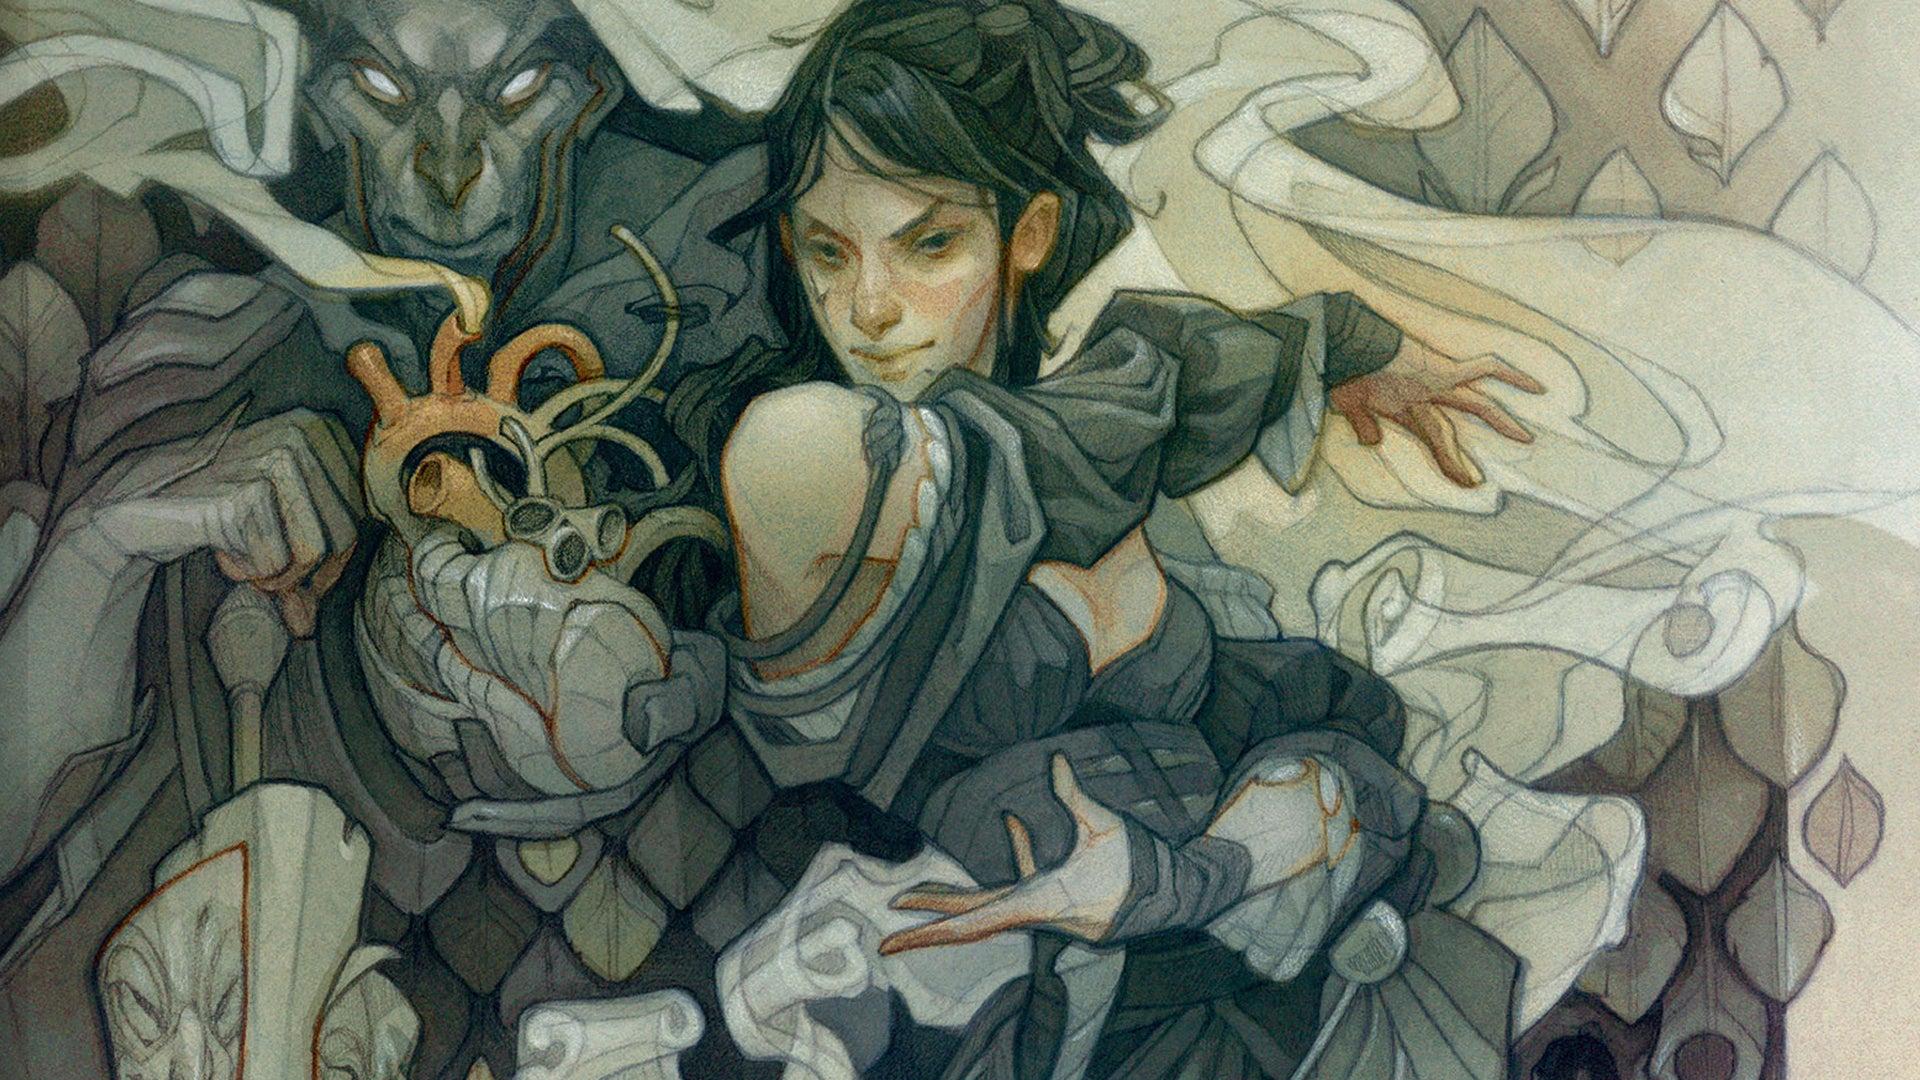 Tasha's Cauldron of Everything D&D RPG alternative cover